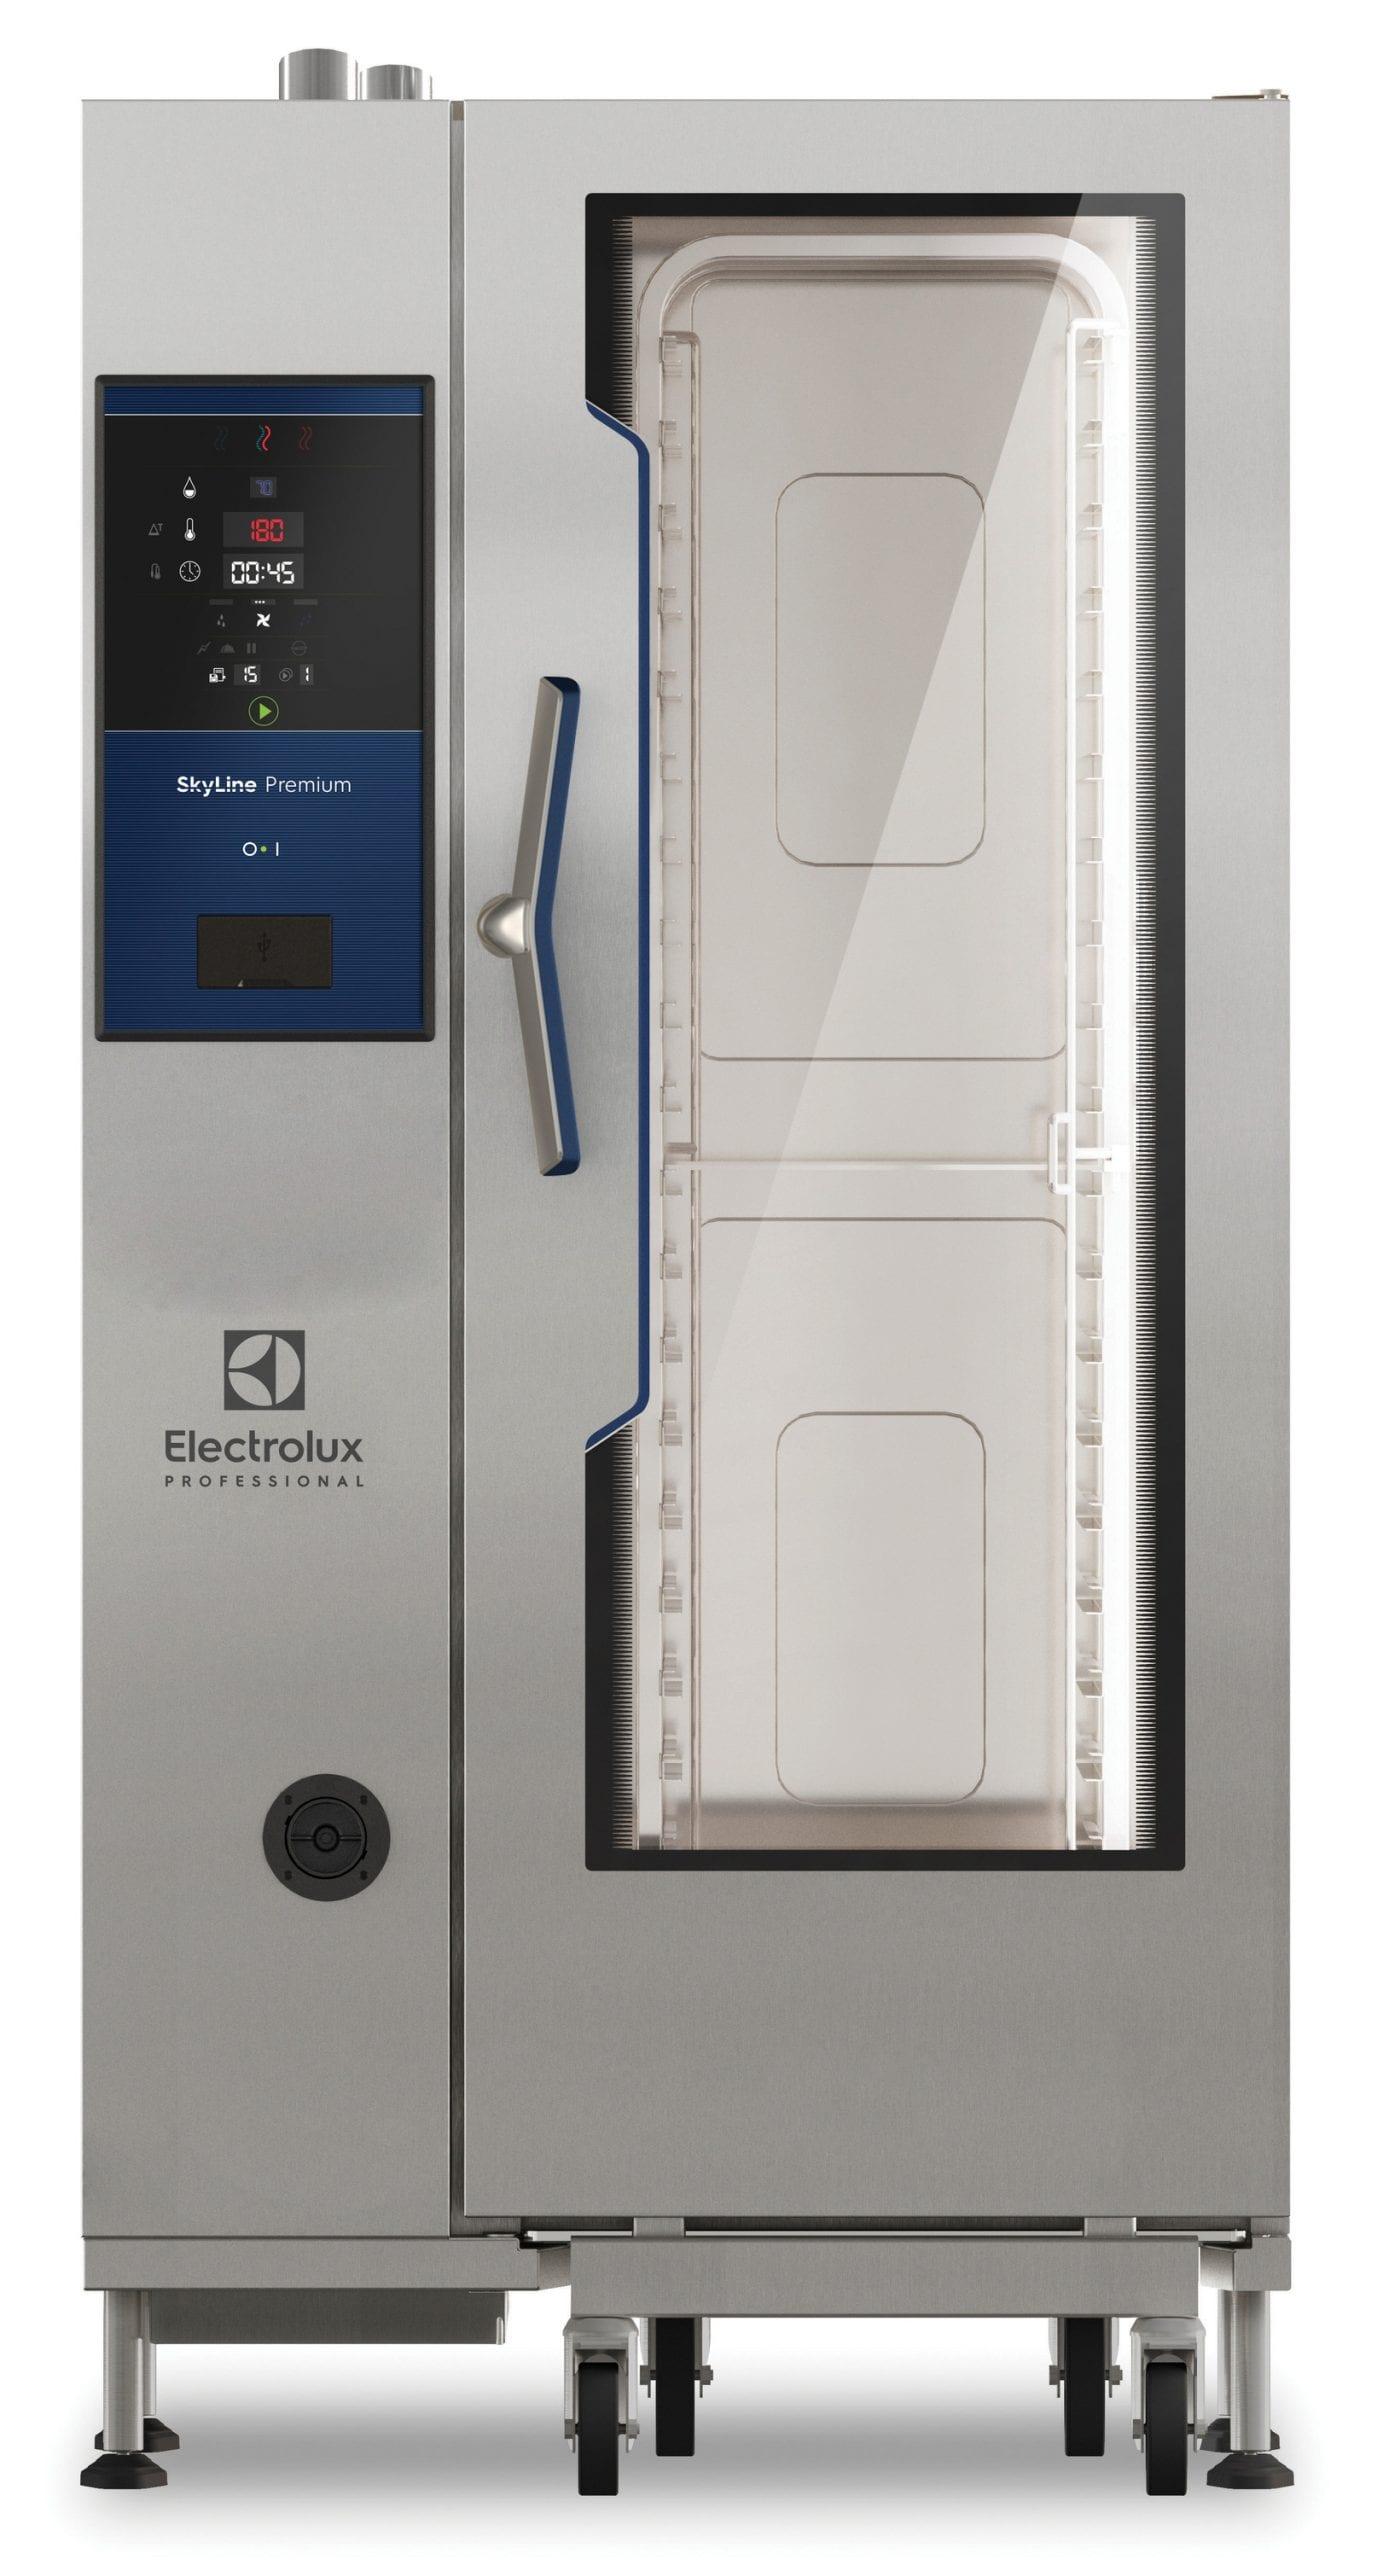 Combi Oven Skyline Premium 20 GN 1/1 Image